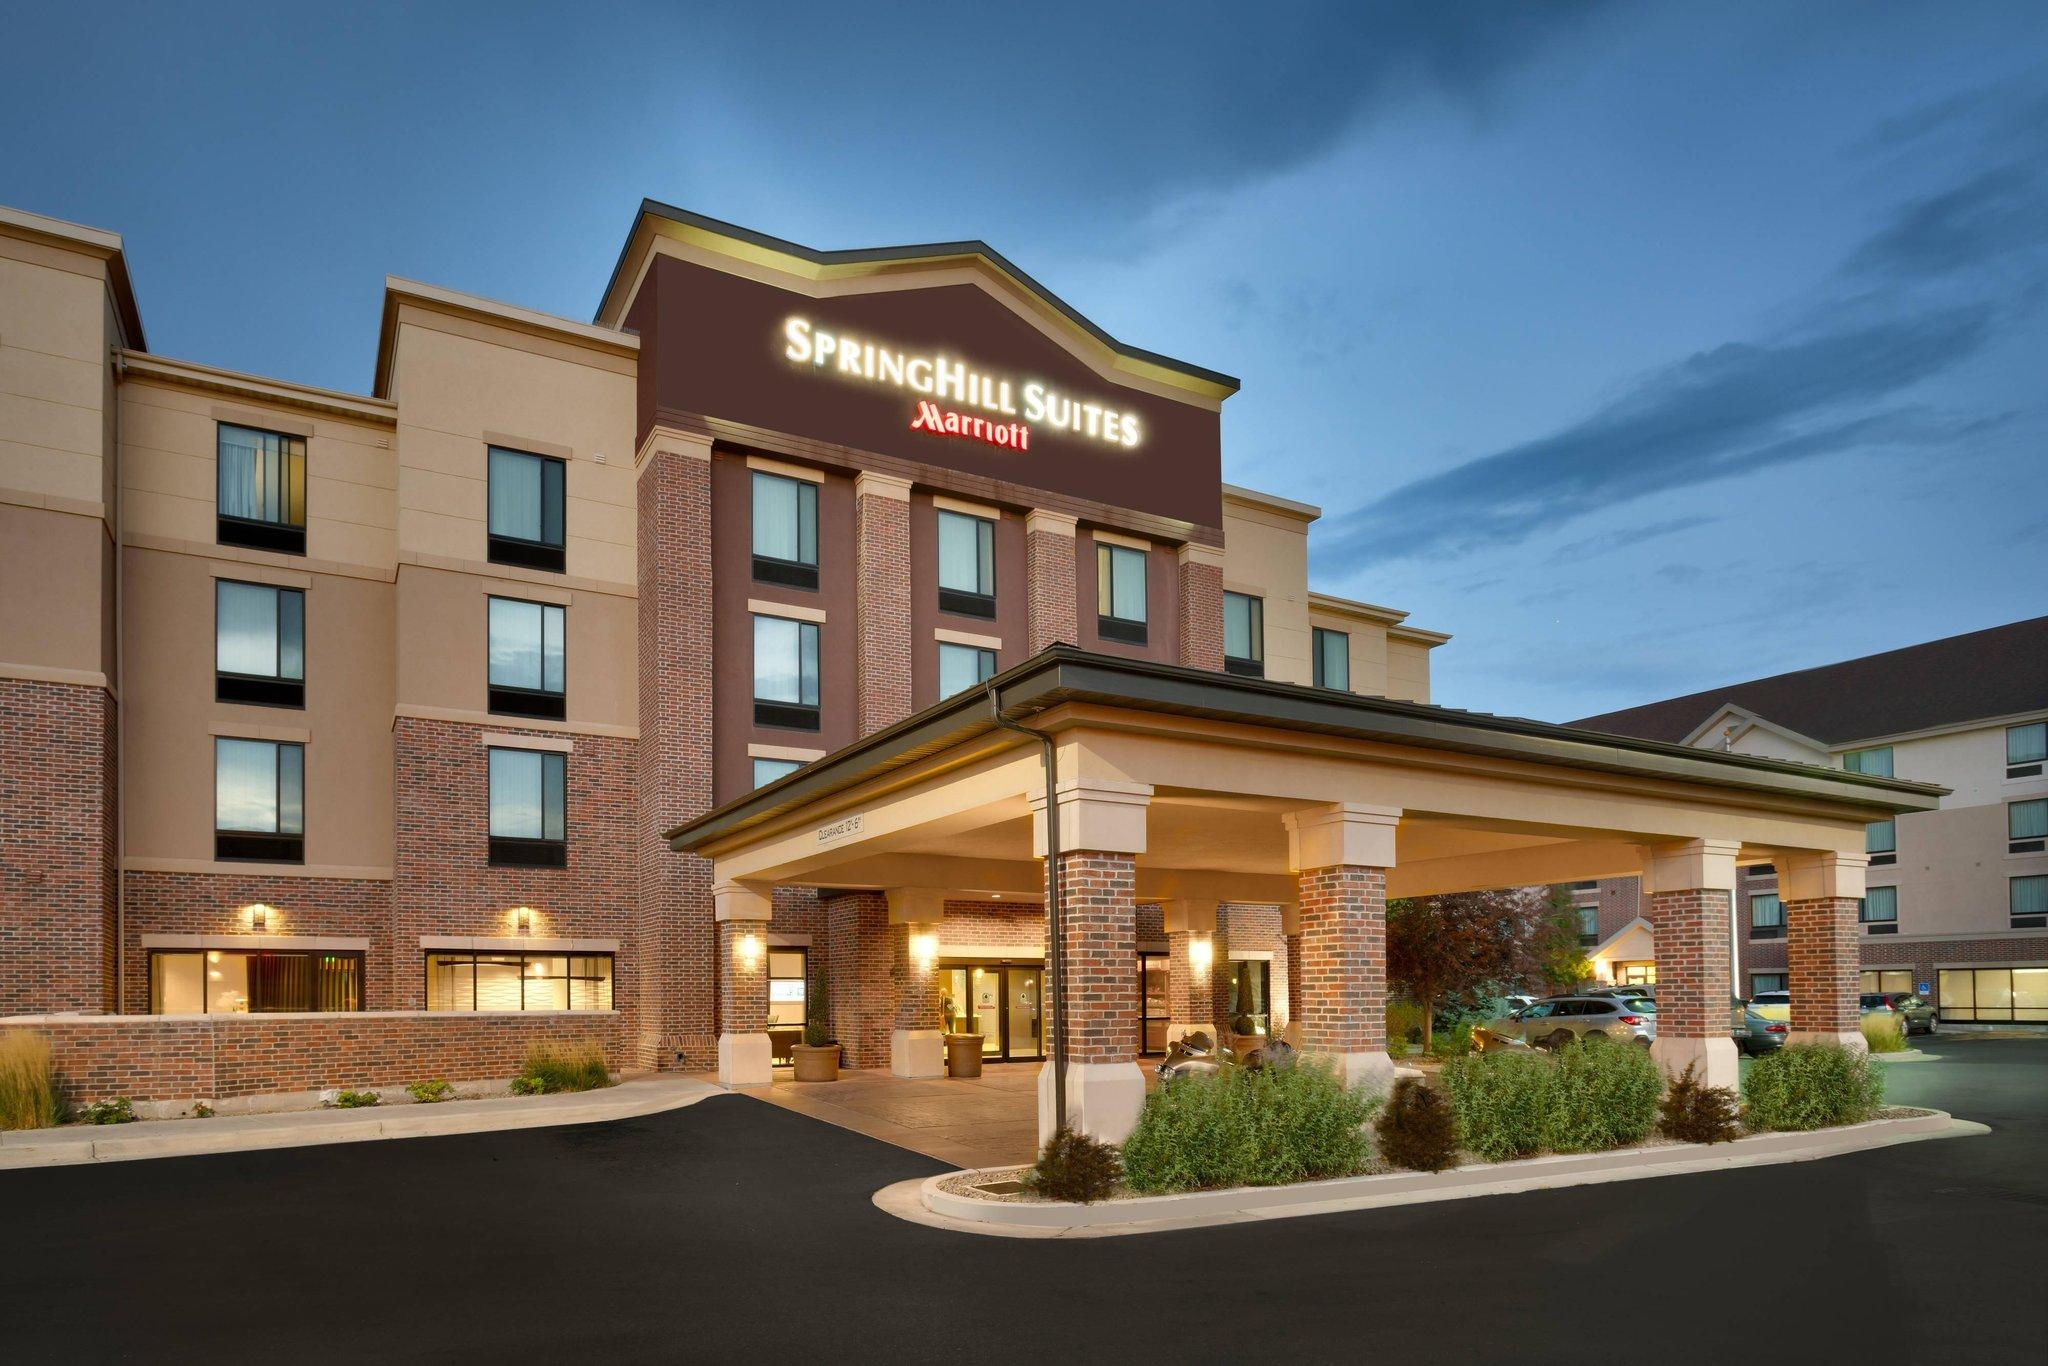 SpringHill Suites by Marriott Vernal